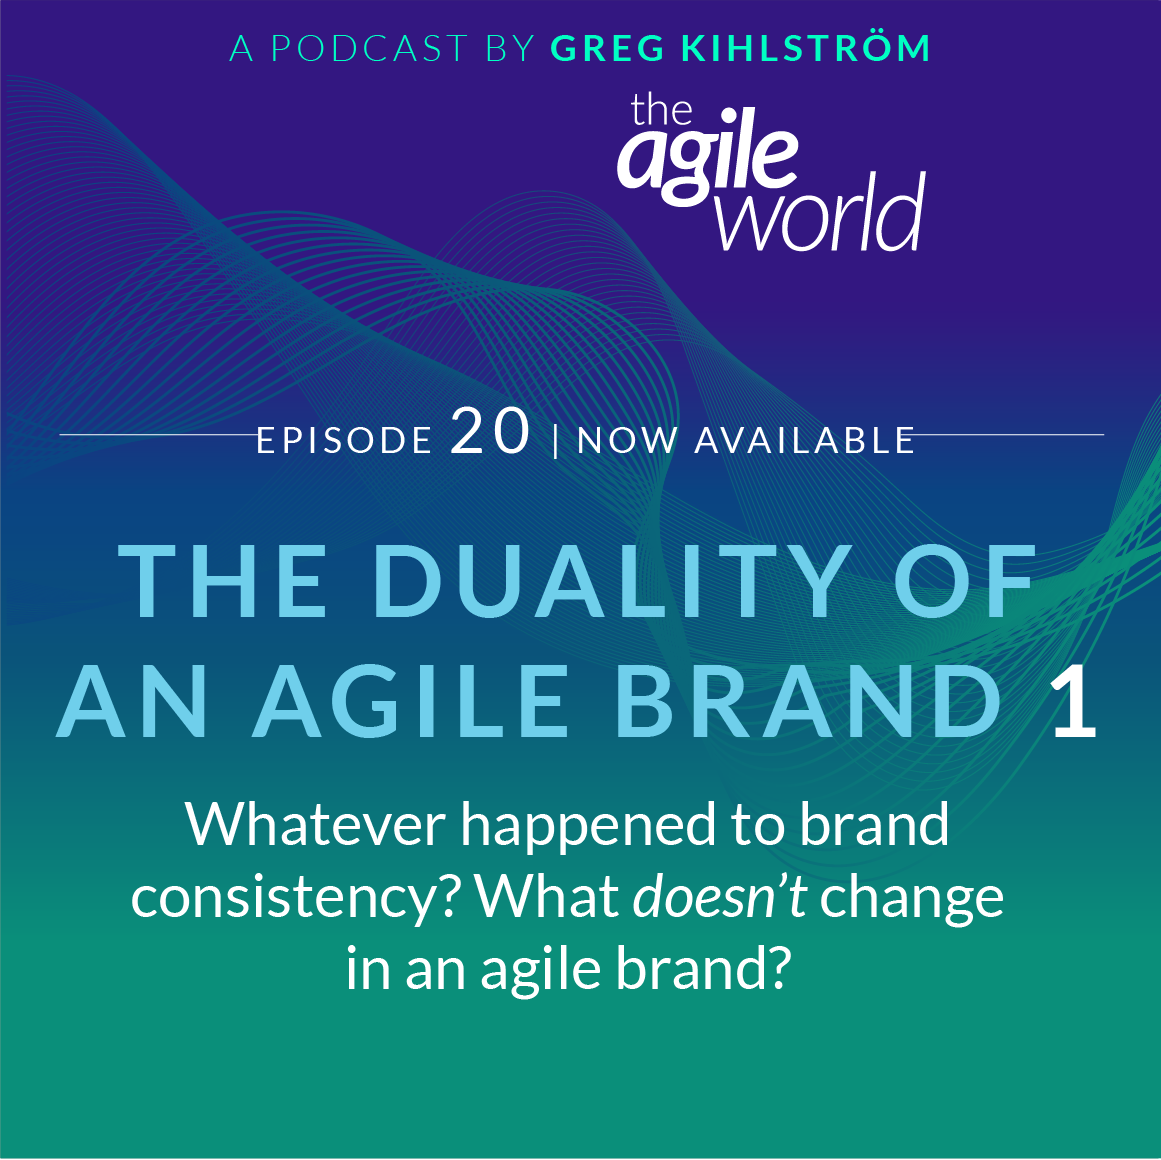 TheAgileWorld-Episode-20-greg-kihlstrom.png